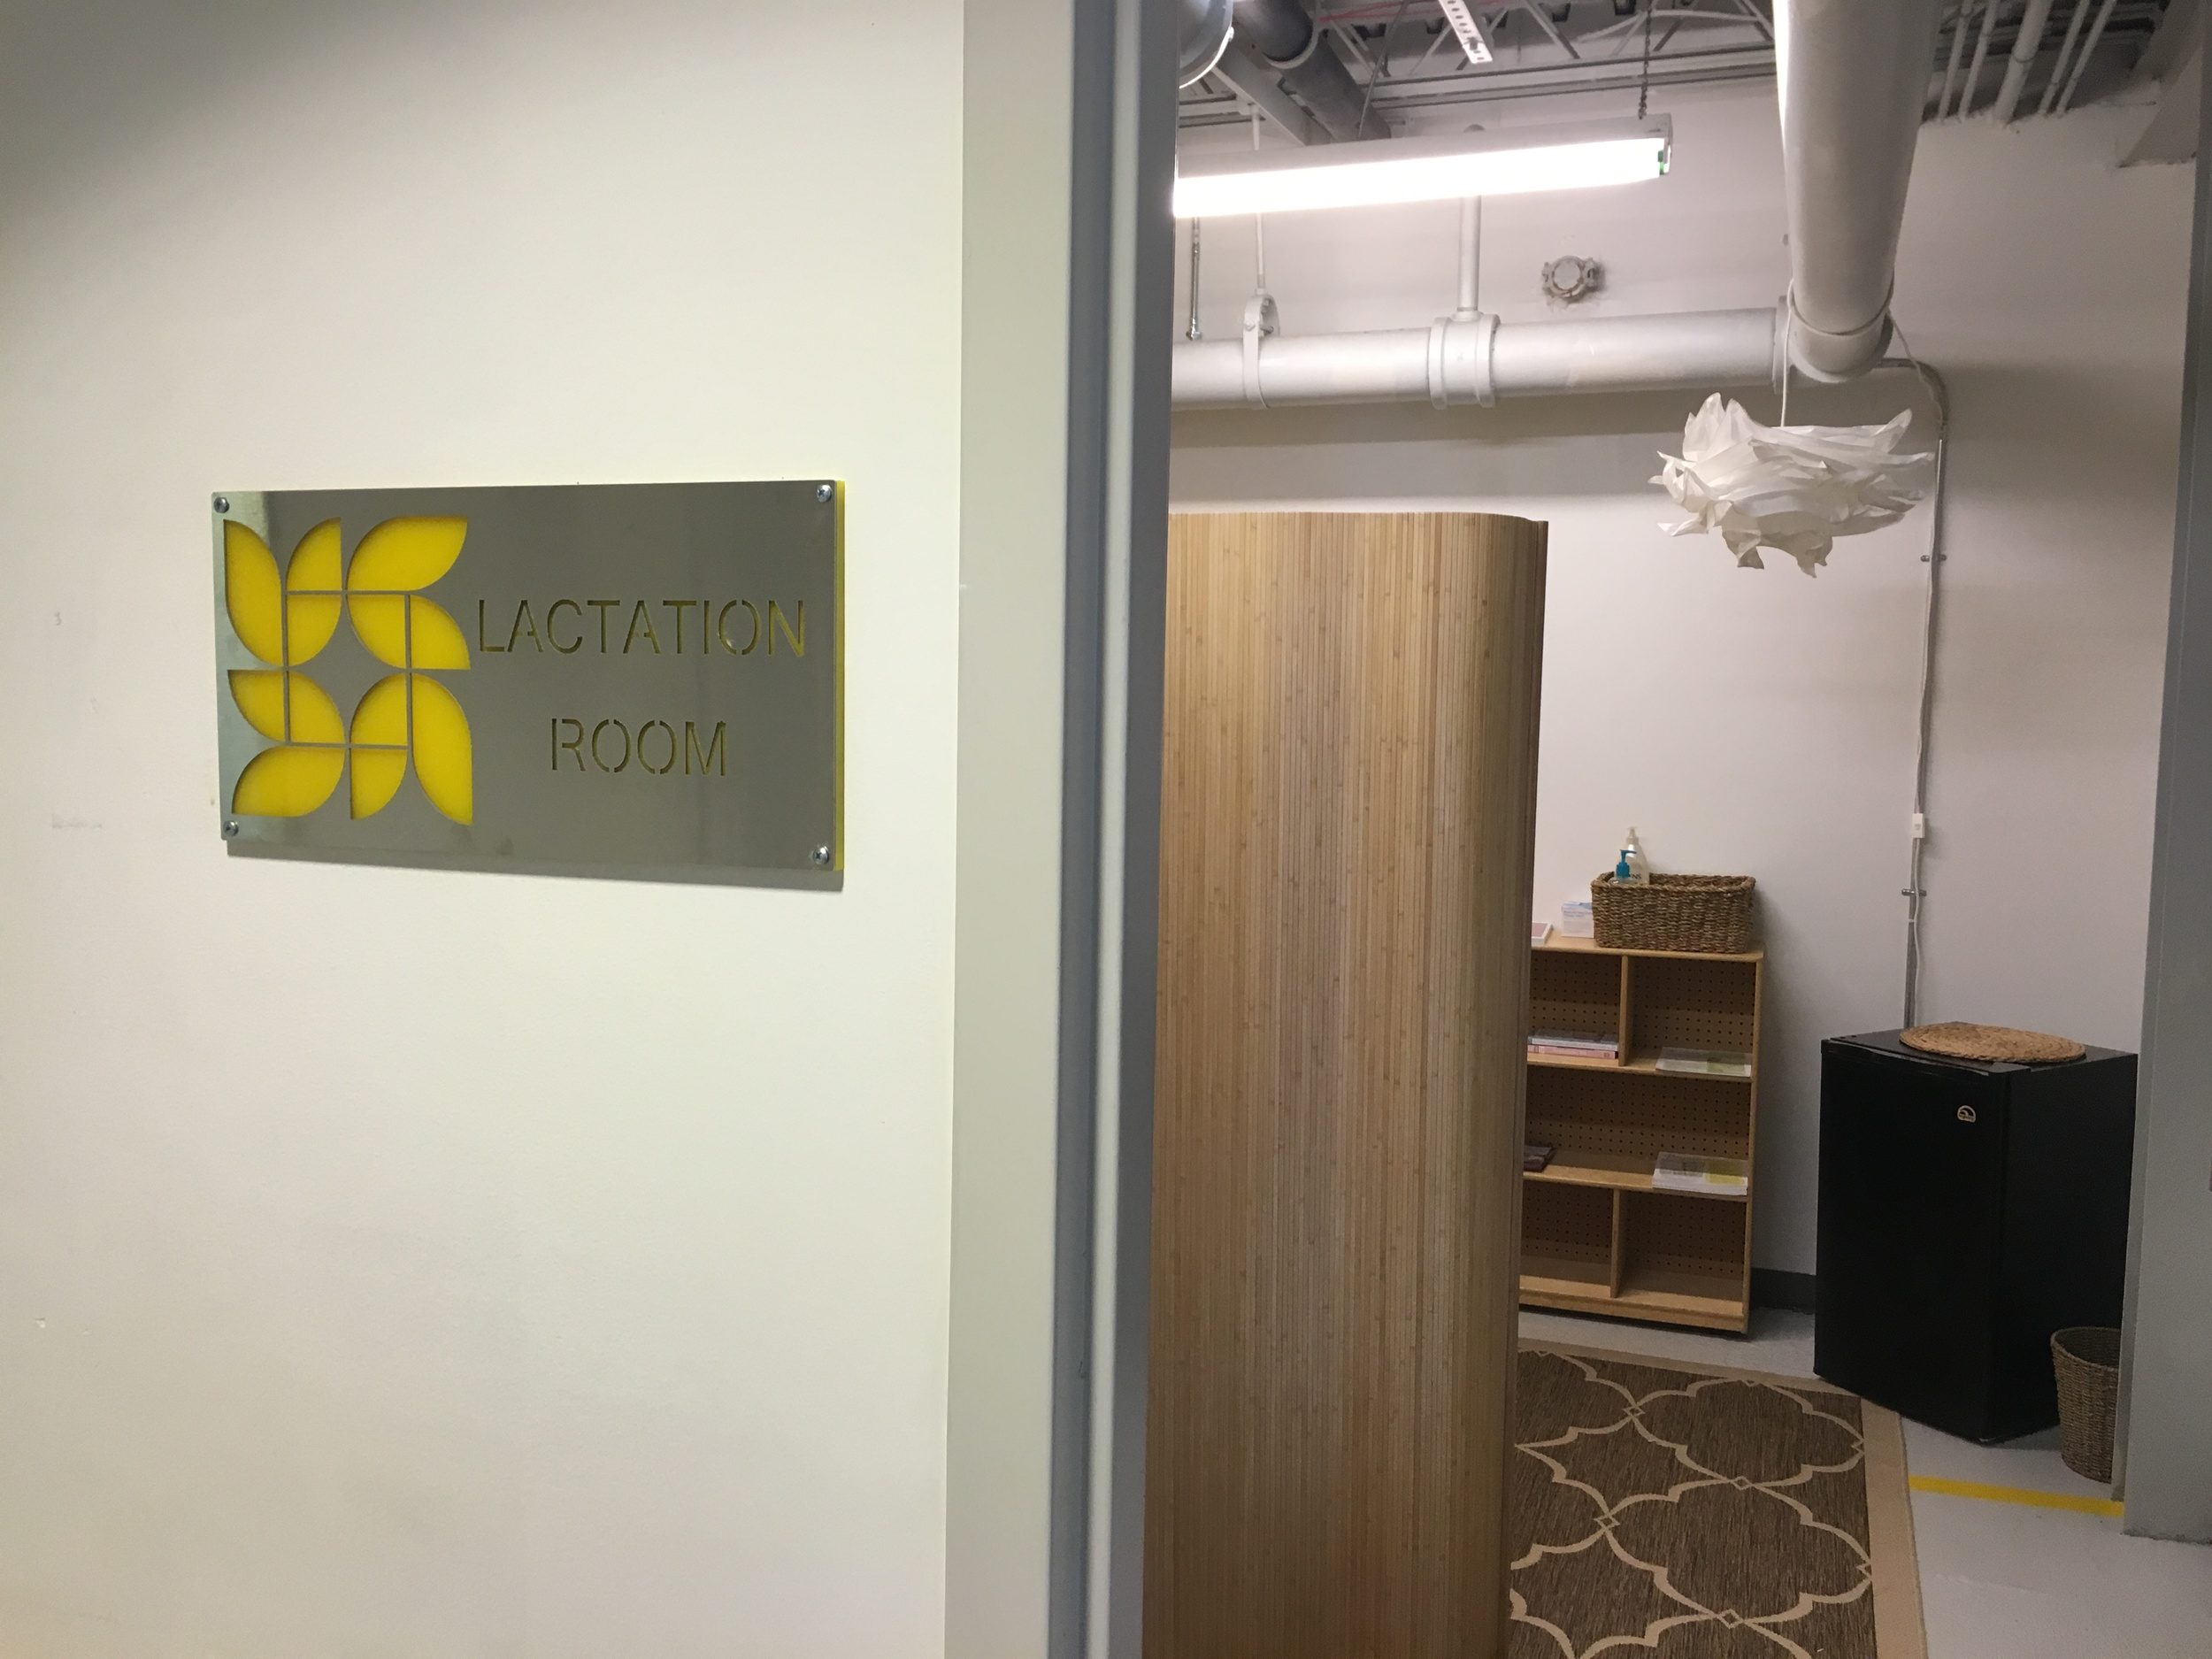 Lactation Room 1.JPG